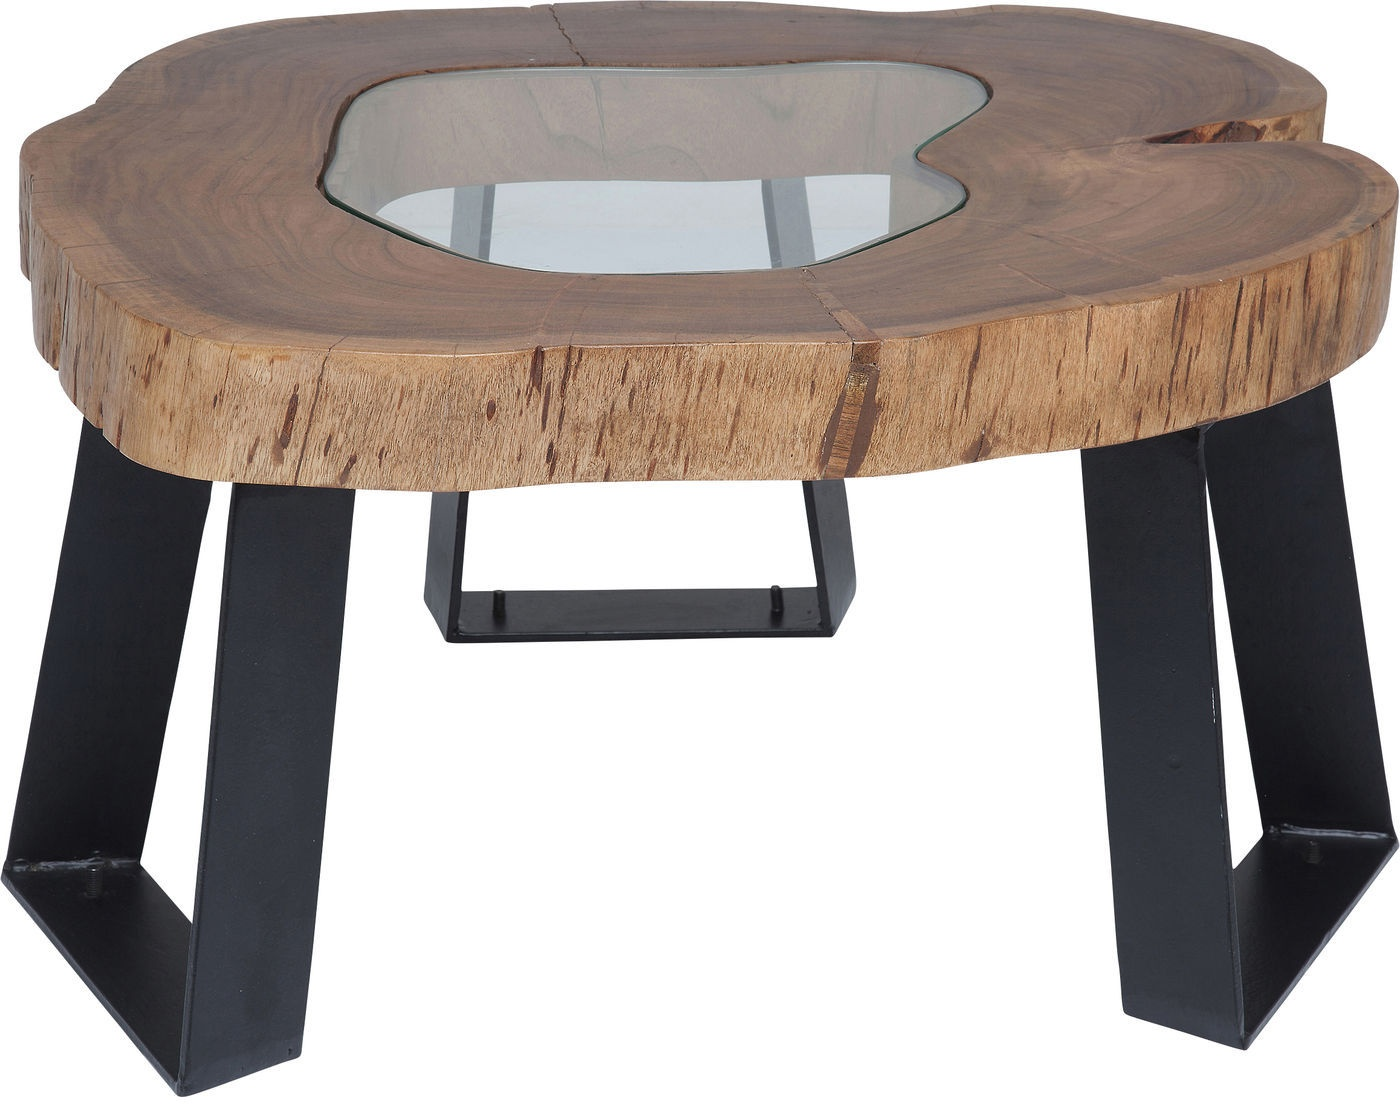 Kare Design Salontafel Fundy L60 X B65 X H35 Cm Houten Tafelblad kopen